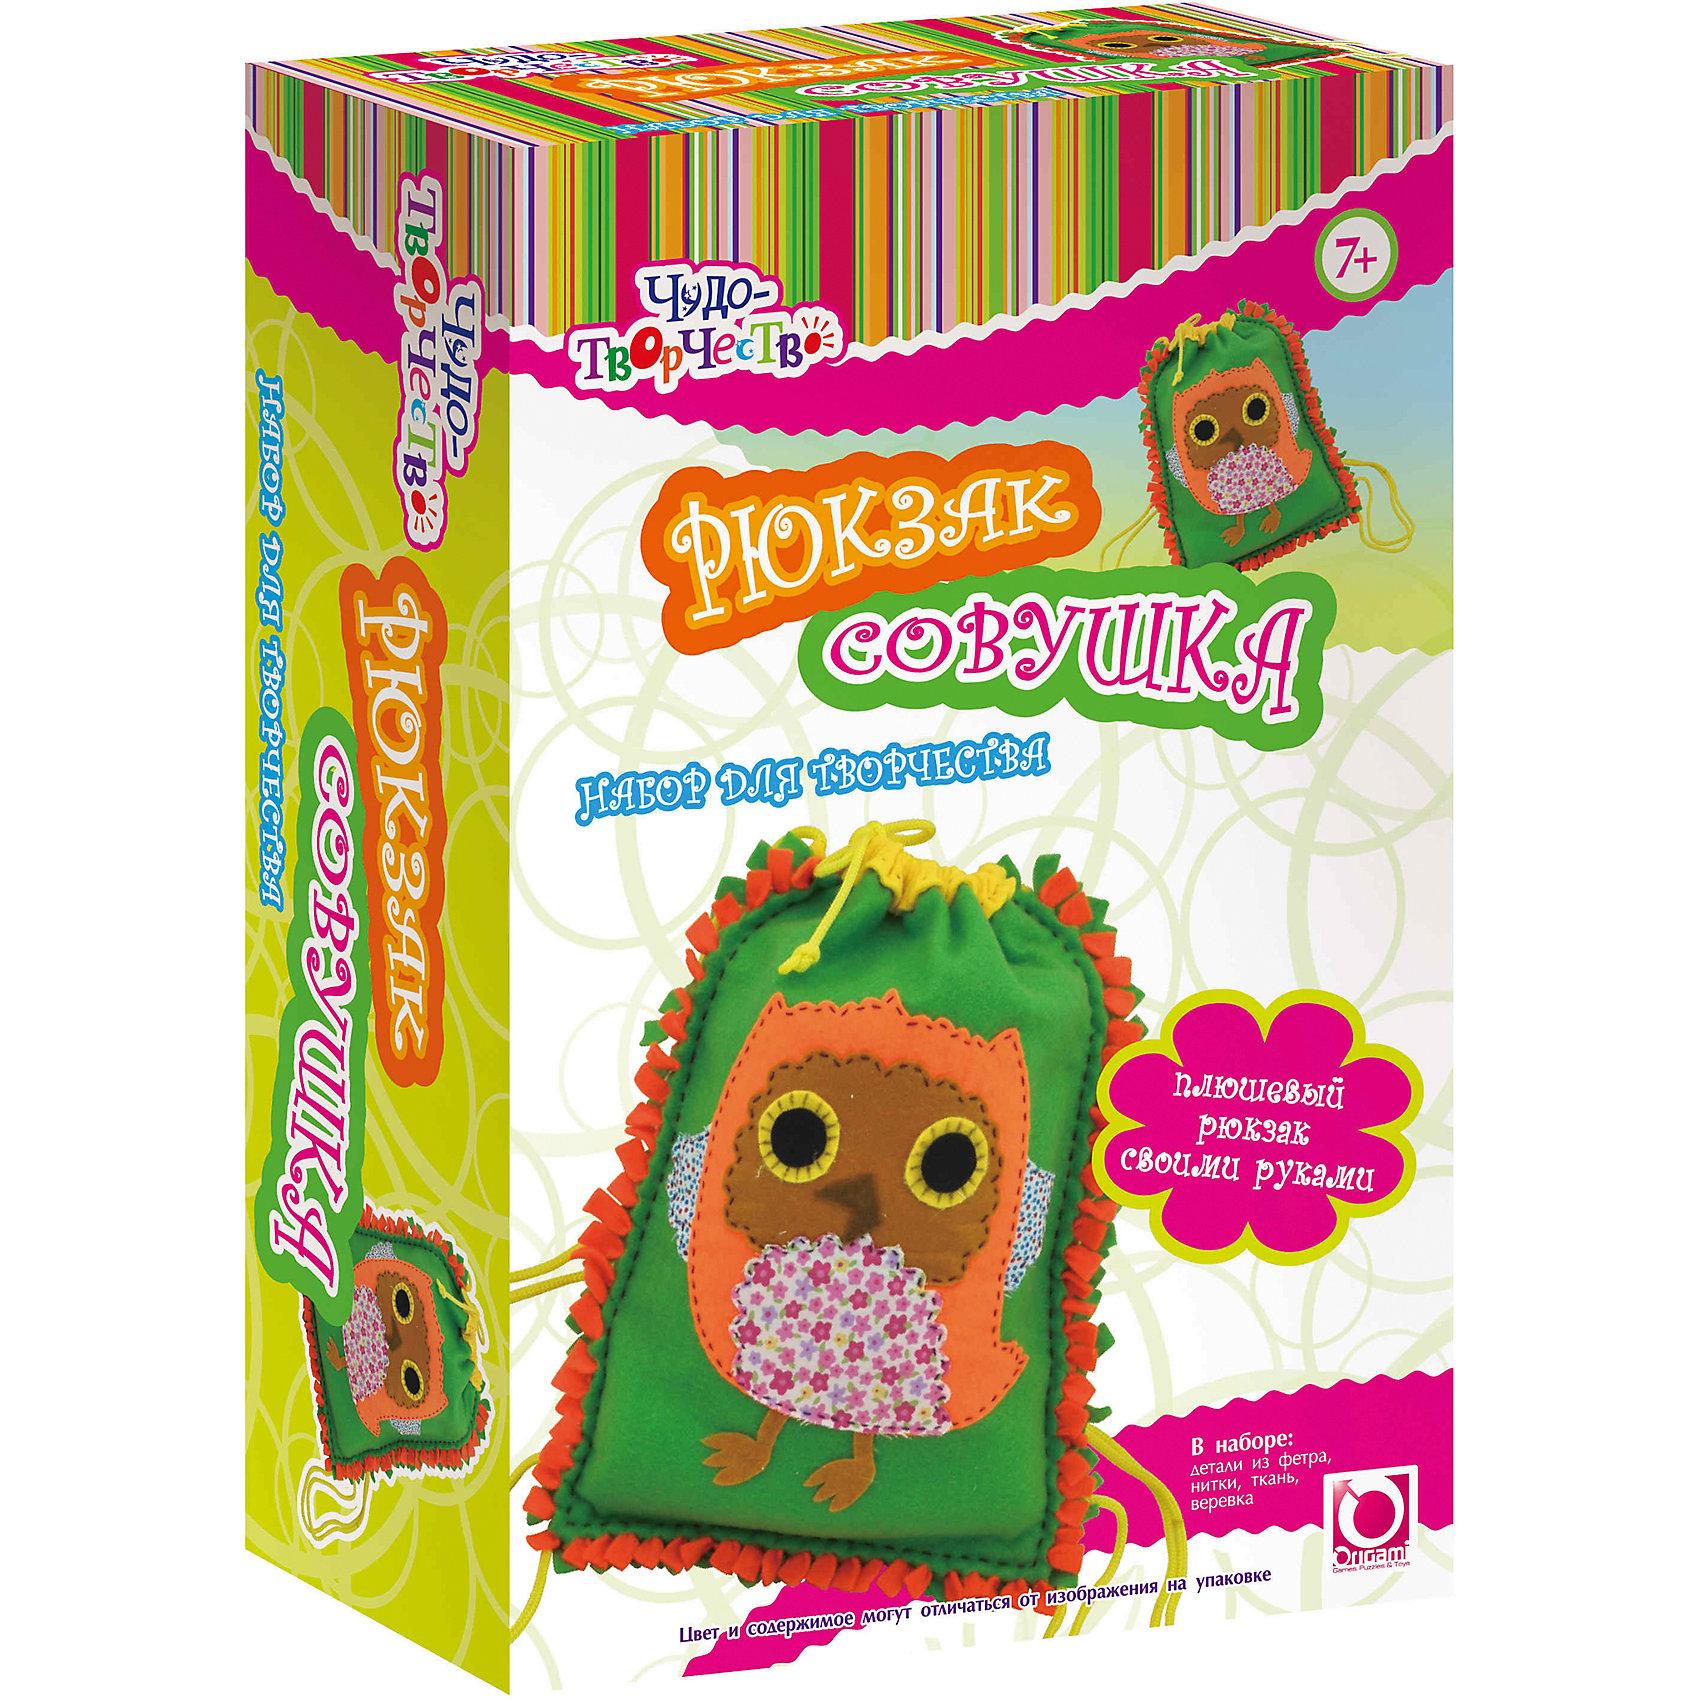 "Origami Набор для создания рюкзака ""Совушка"", Оригами"